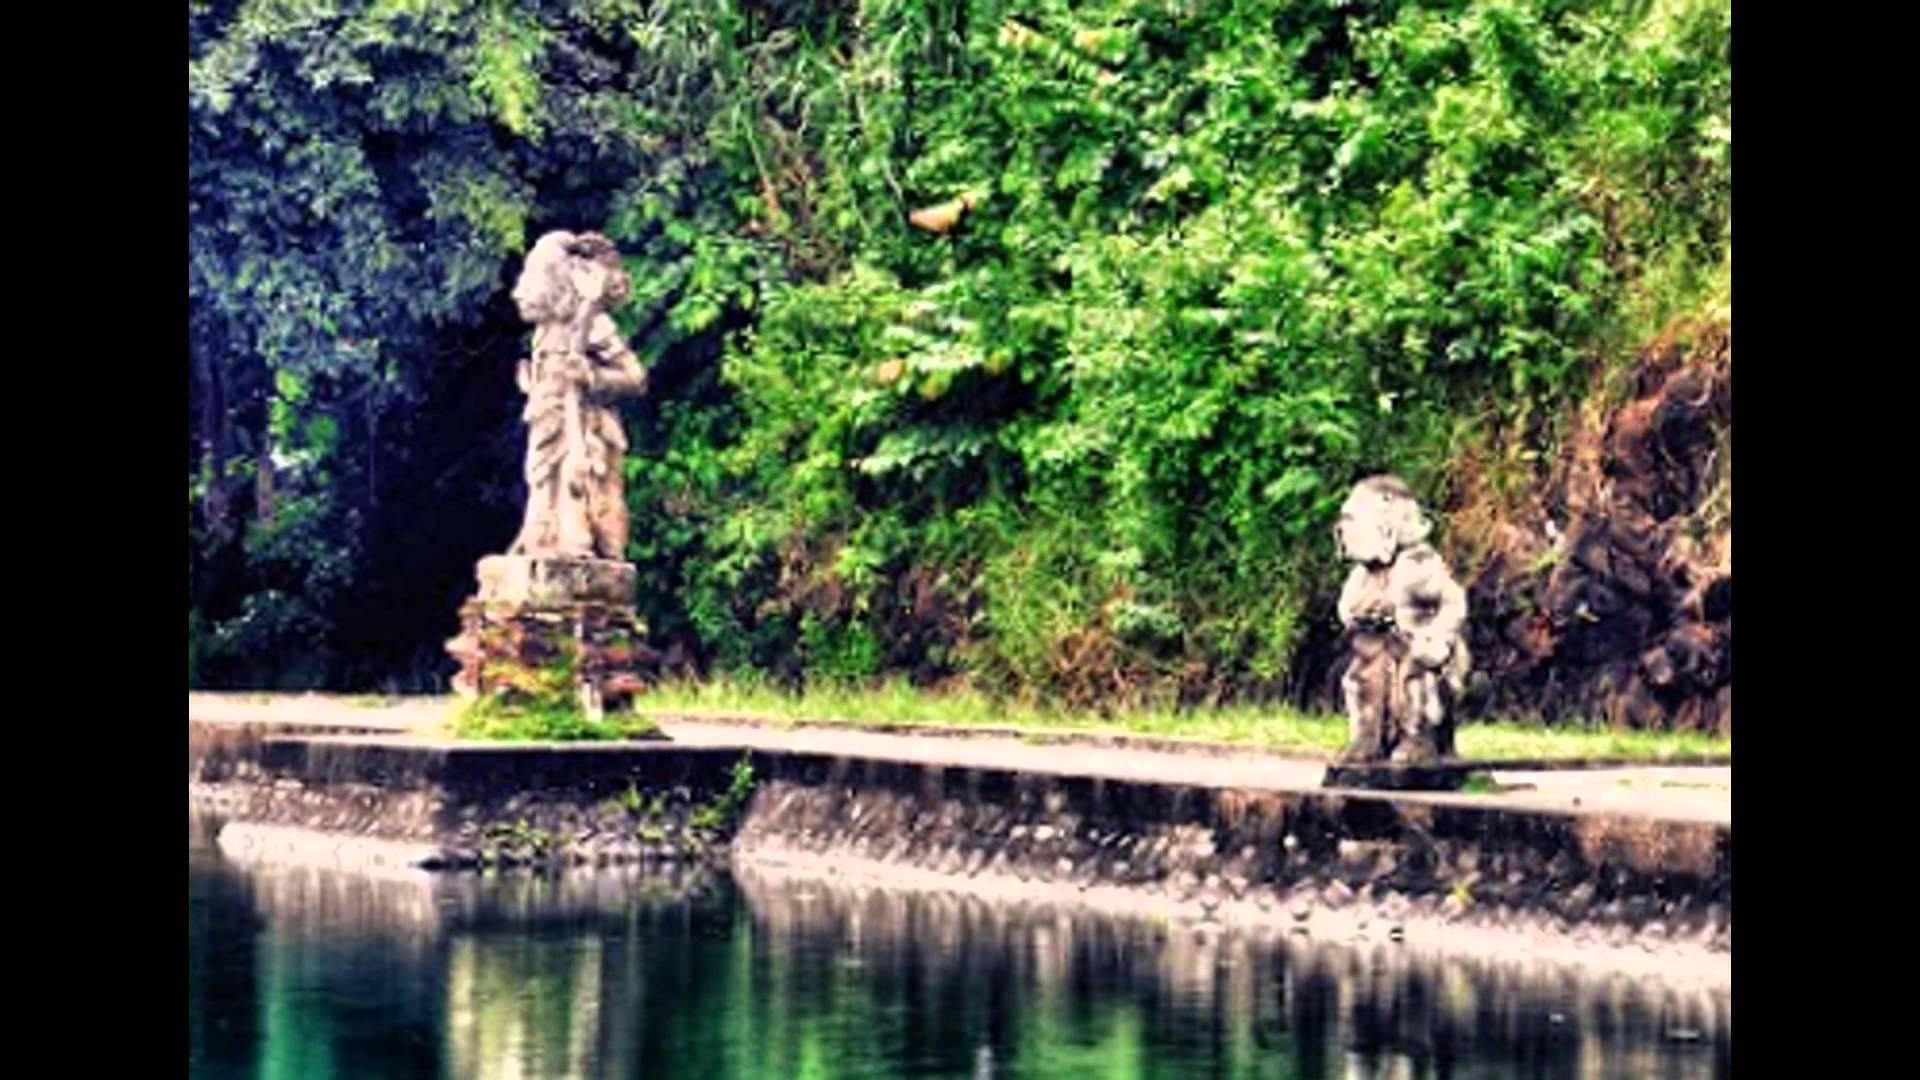 Taman Narmada Nusa Tenggara Barat Tempat Wisata Indonesia Youtube Pura